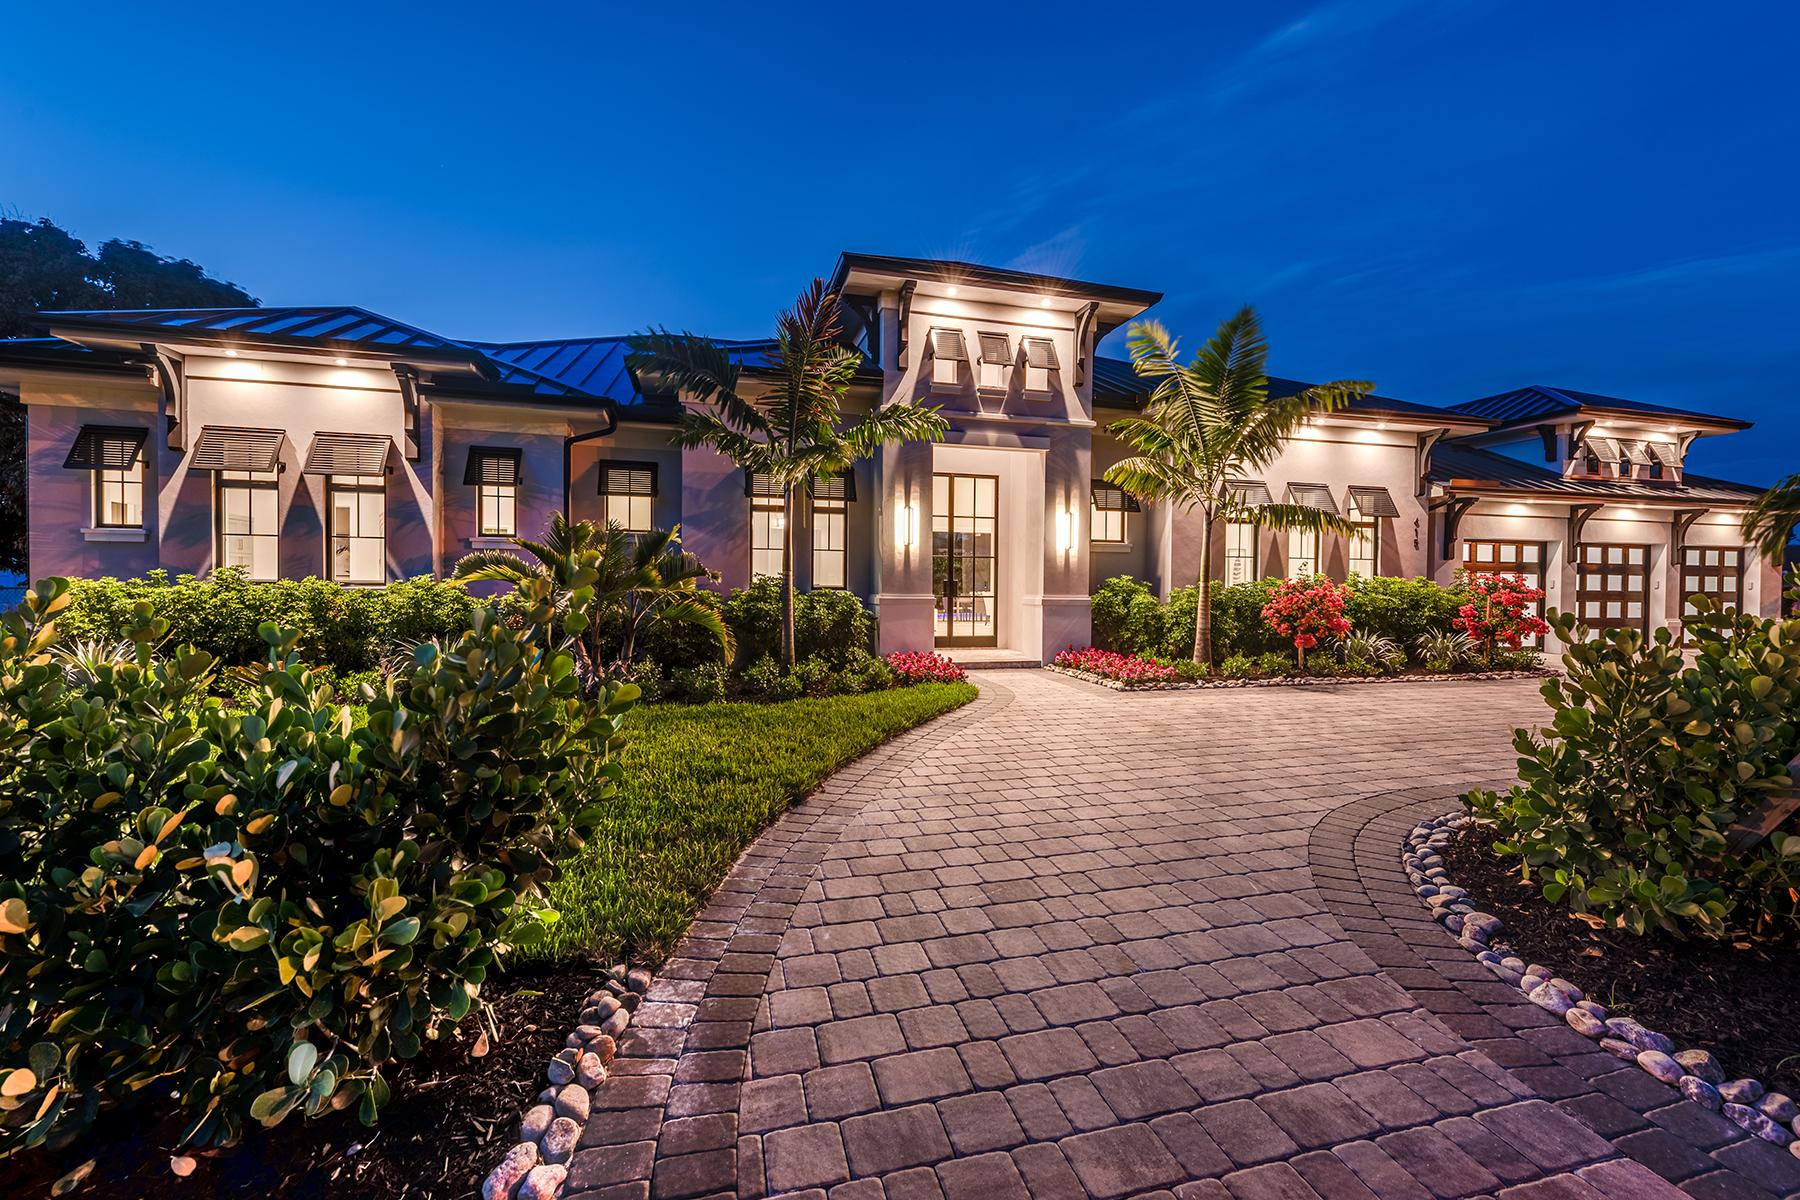 single family homes 為 出售 在 NAPLES - MOORINGS 615 Harbour Drive 那不勒斯, 佛羅里達州 34103 美國